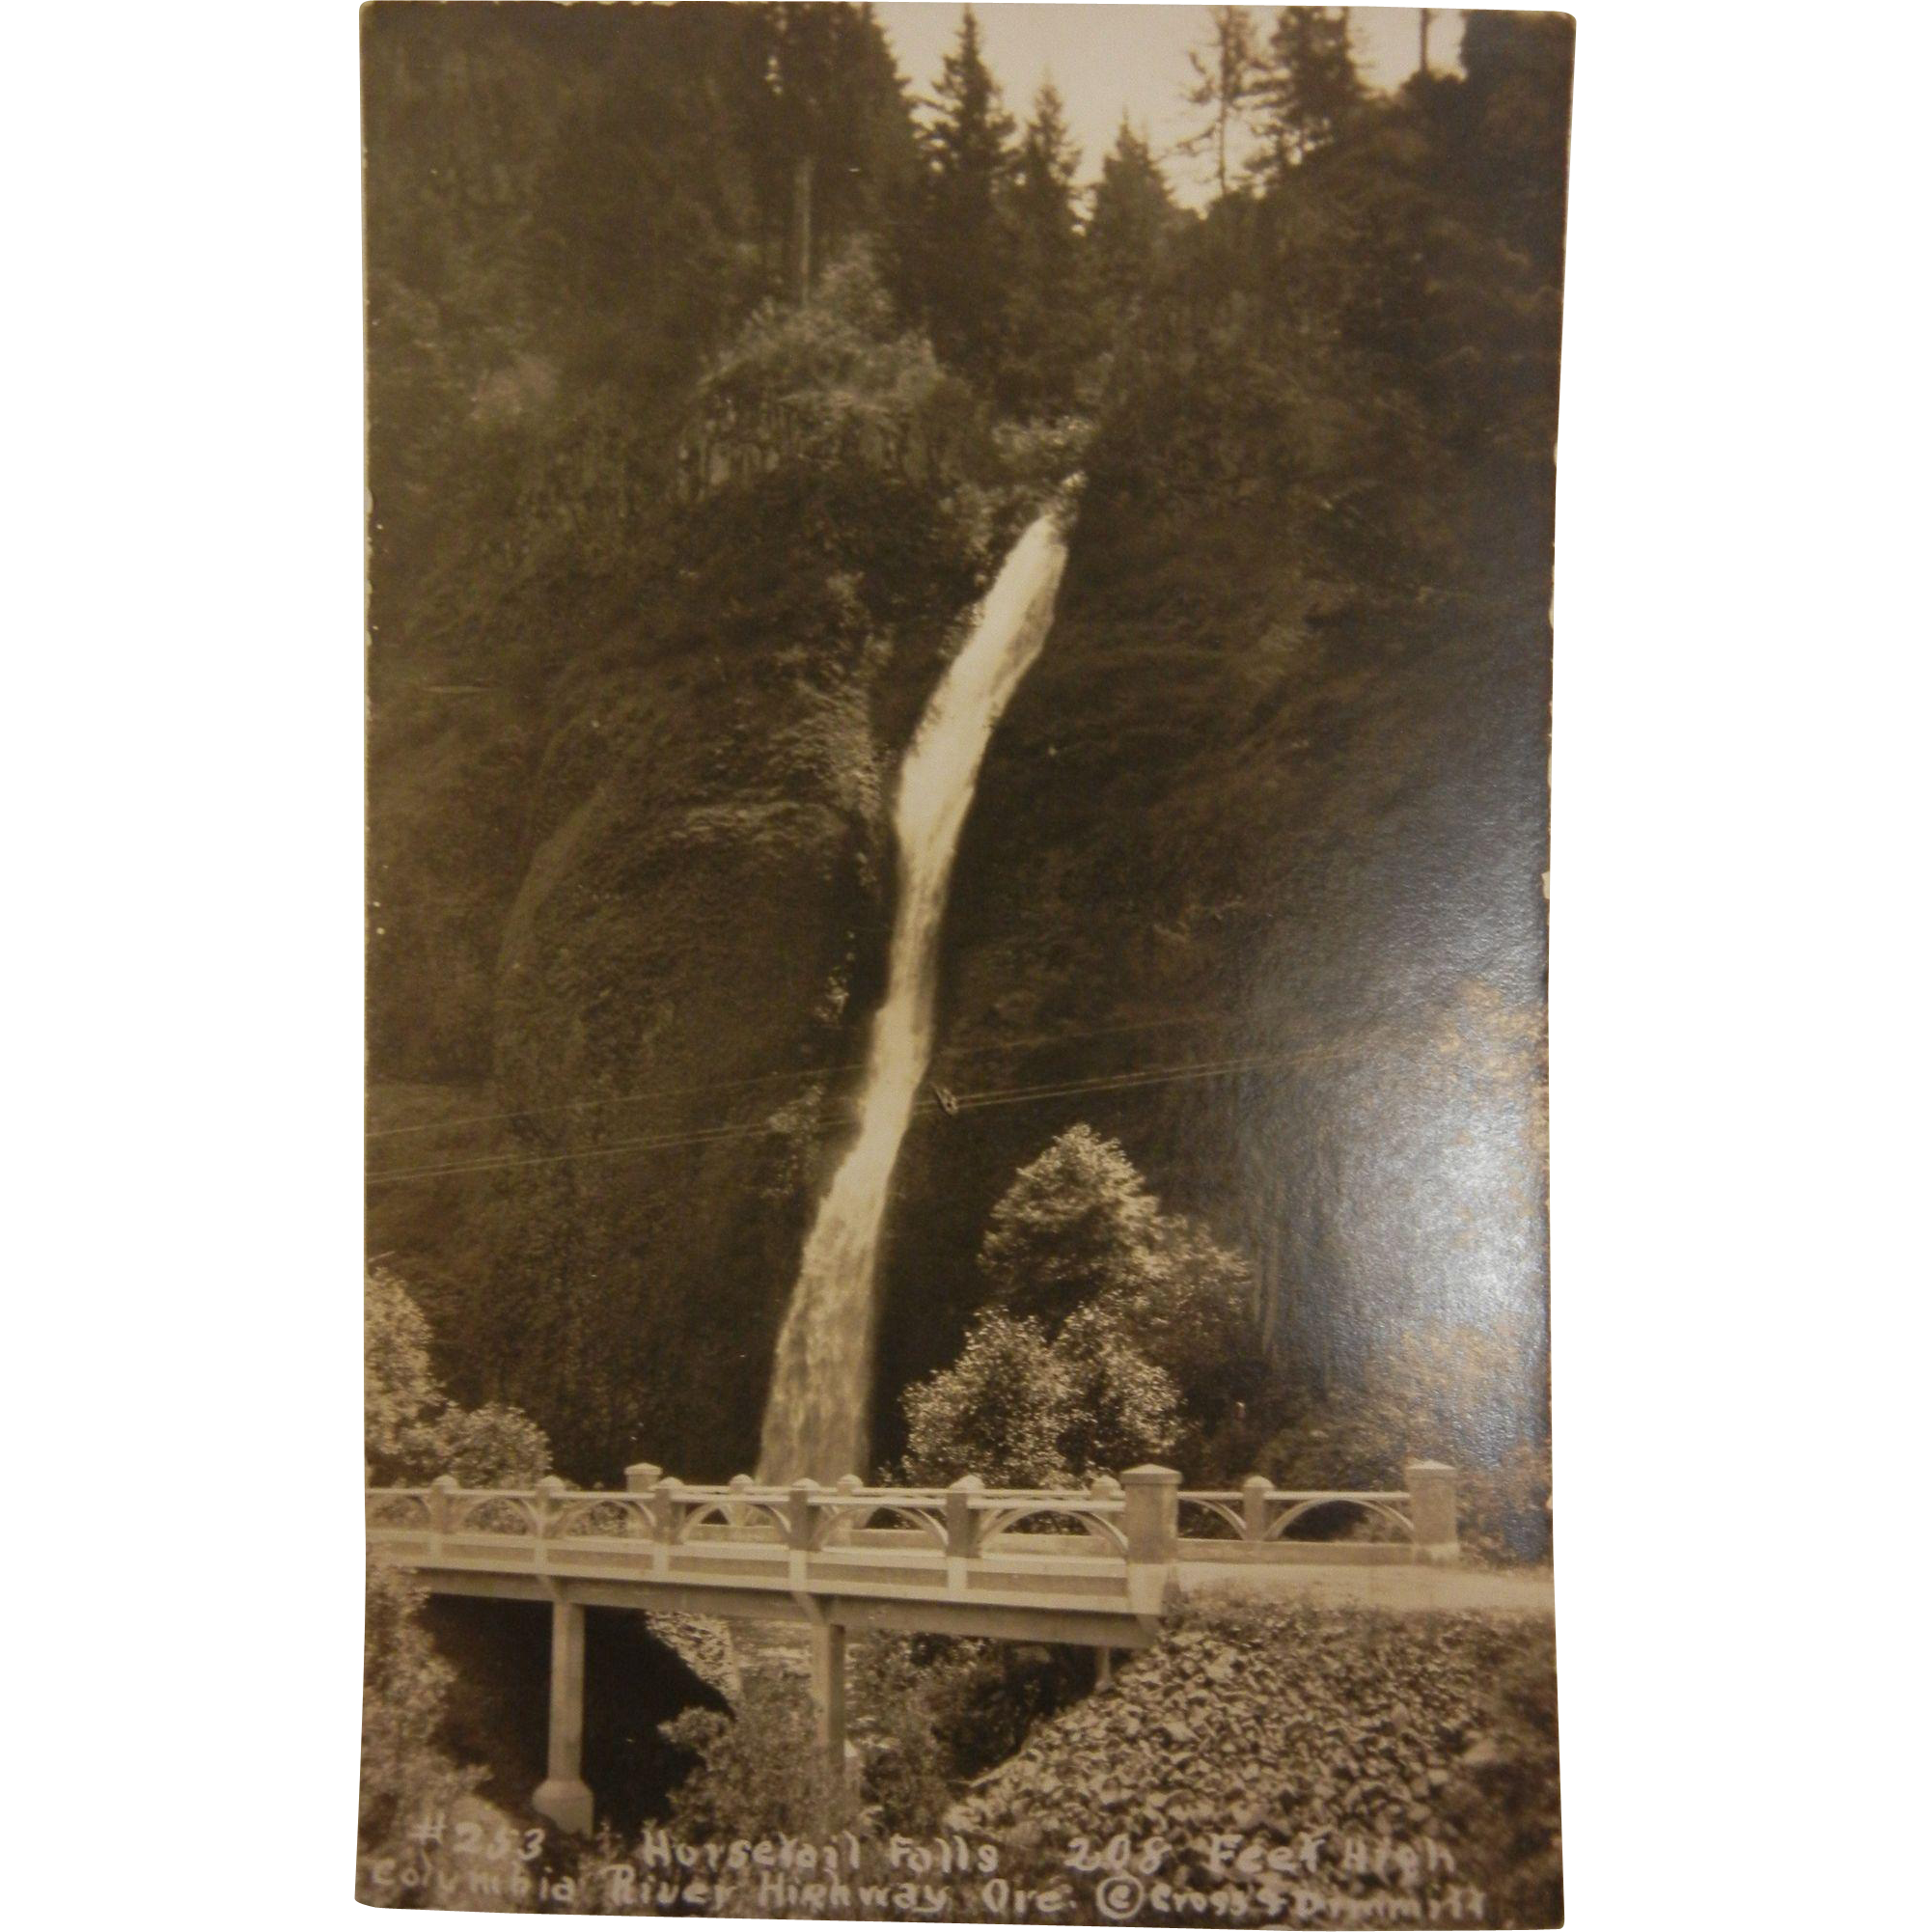 Vintage Original B&W Photo Postcard of Horsetail Falls in Oregon